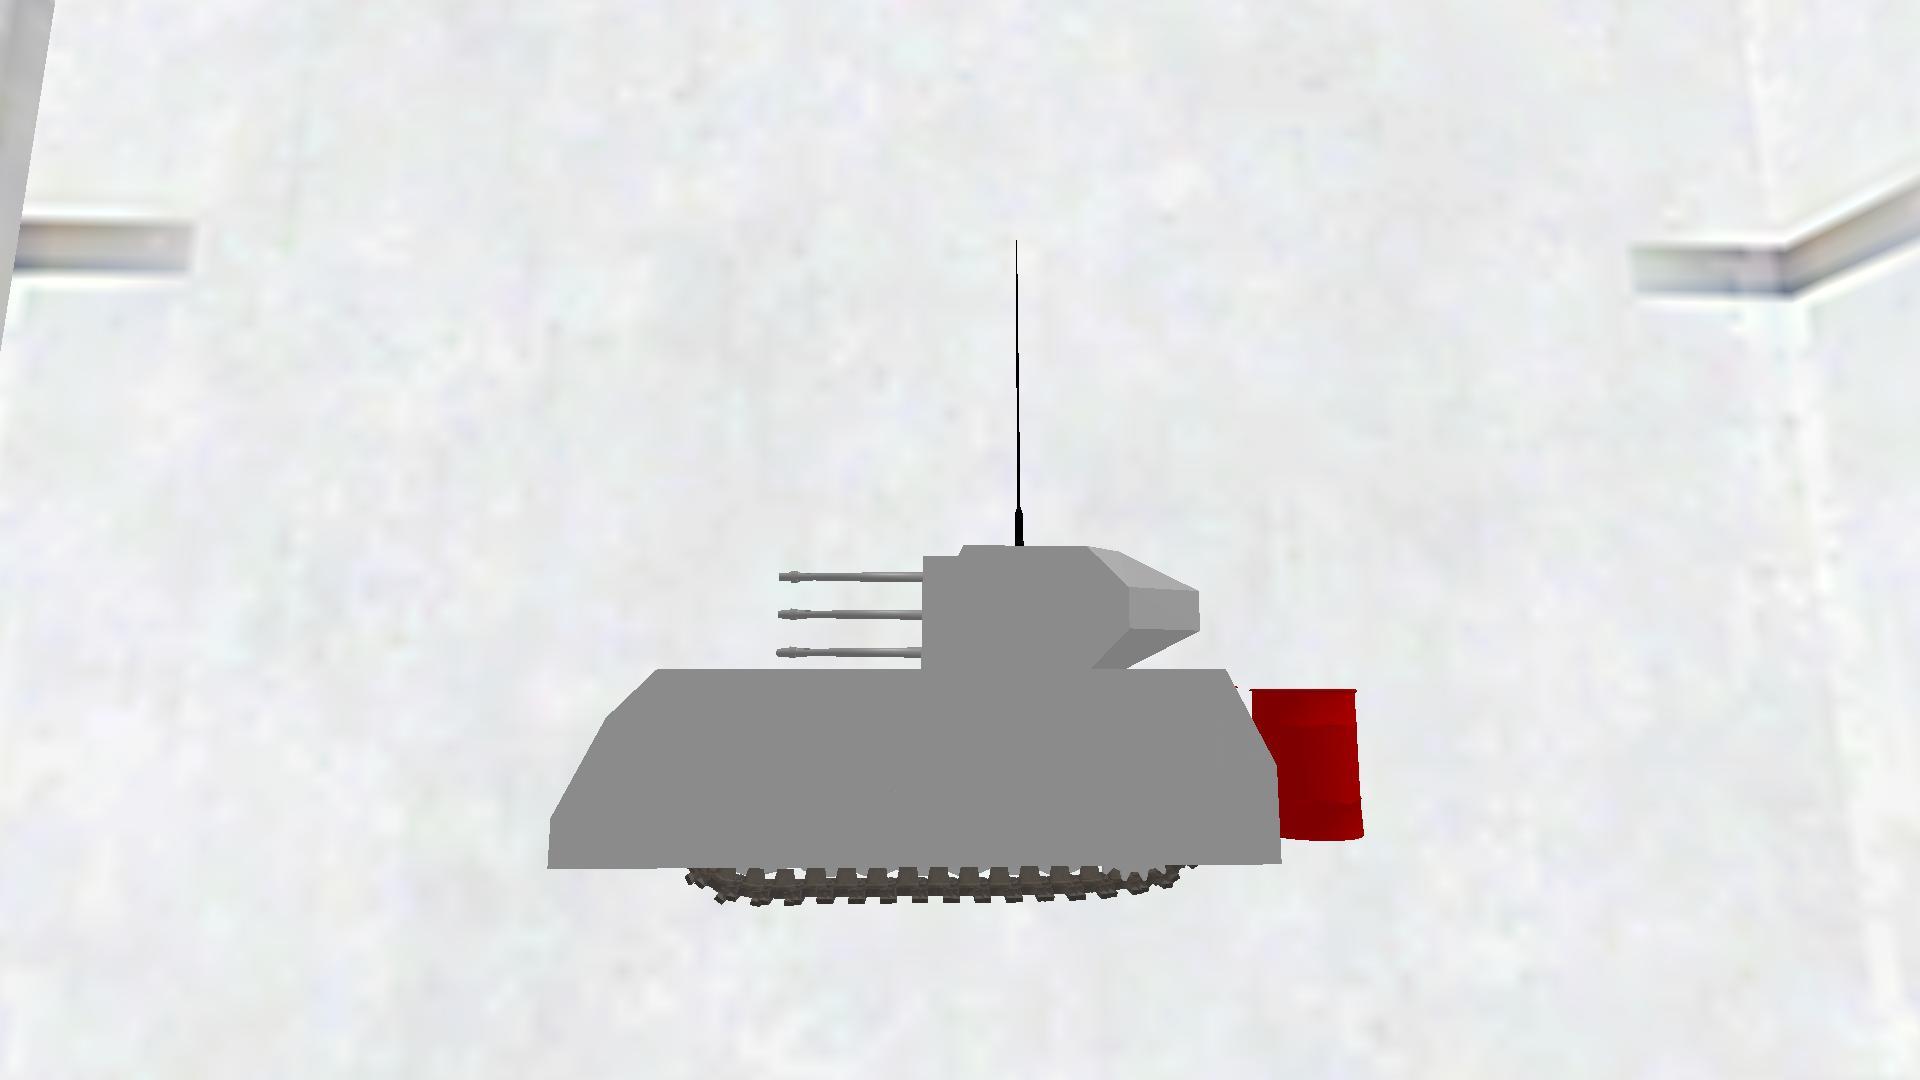 LT10000-2 finaltank-2